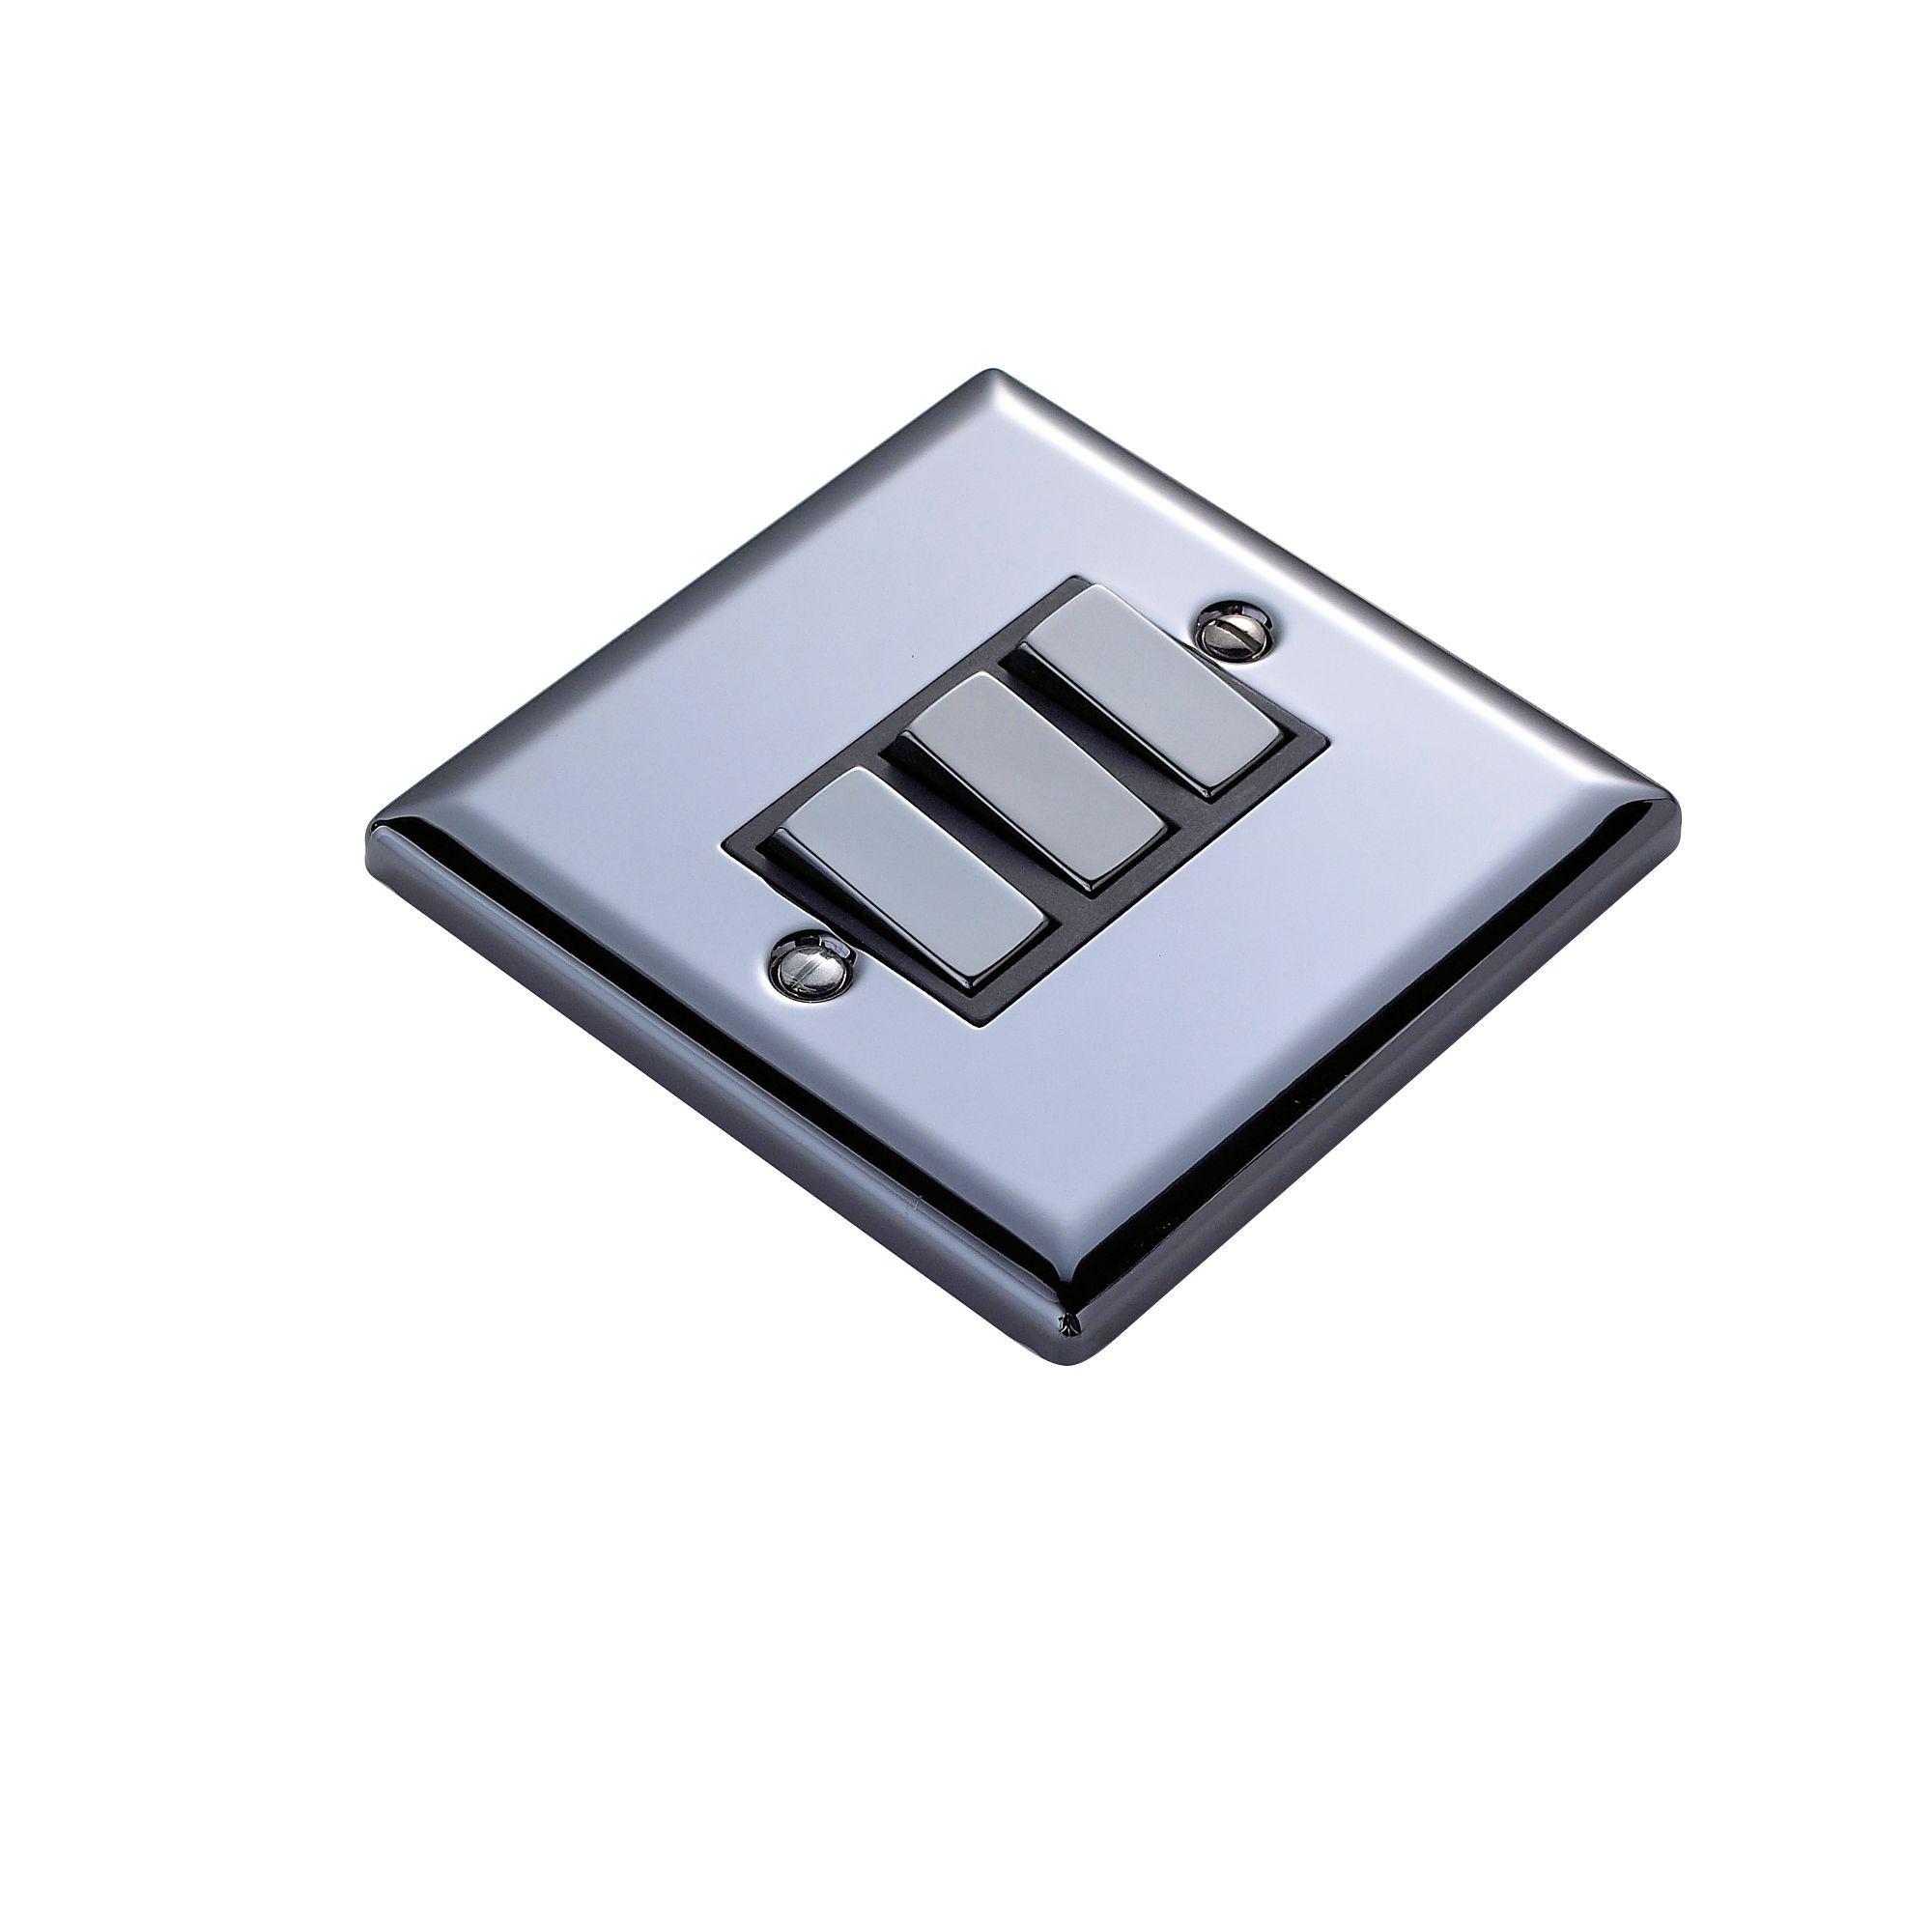 Volex 10ax 2 Way Black Nickel Effect Triple Light Switch